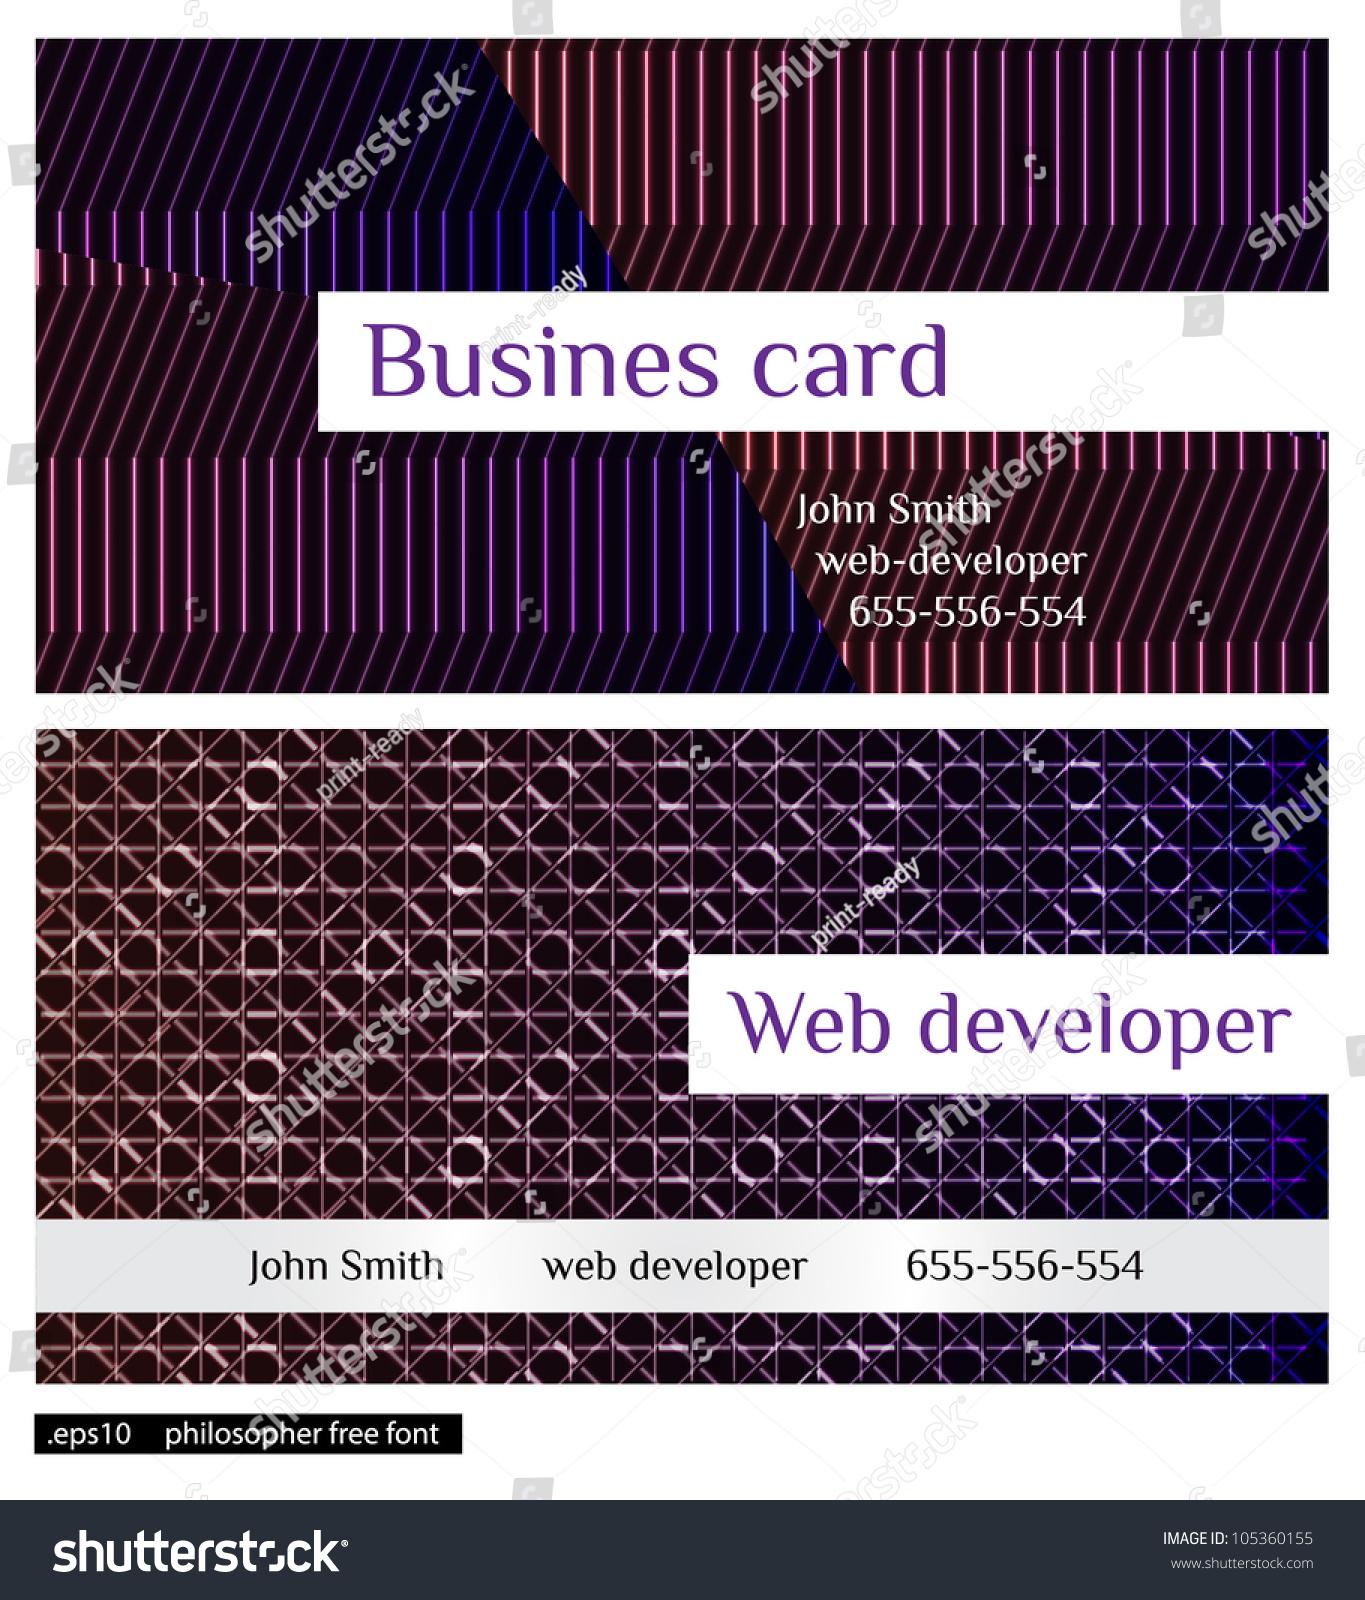 Web Developer Business Cards Stock Vector 105360155 - Shutterstock